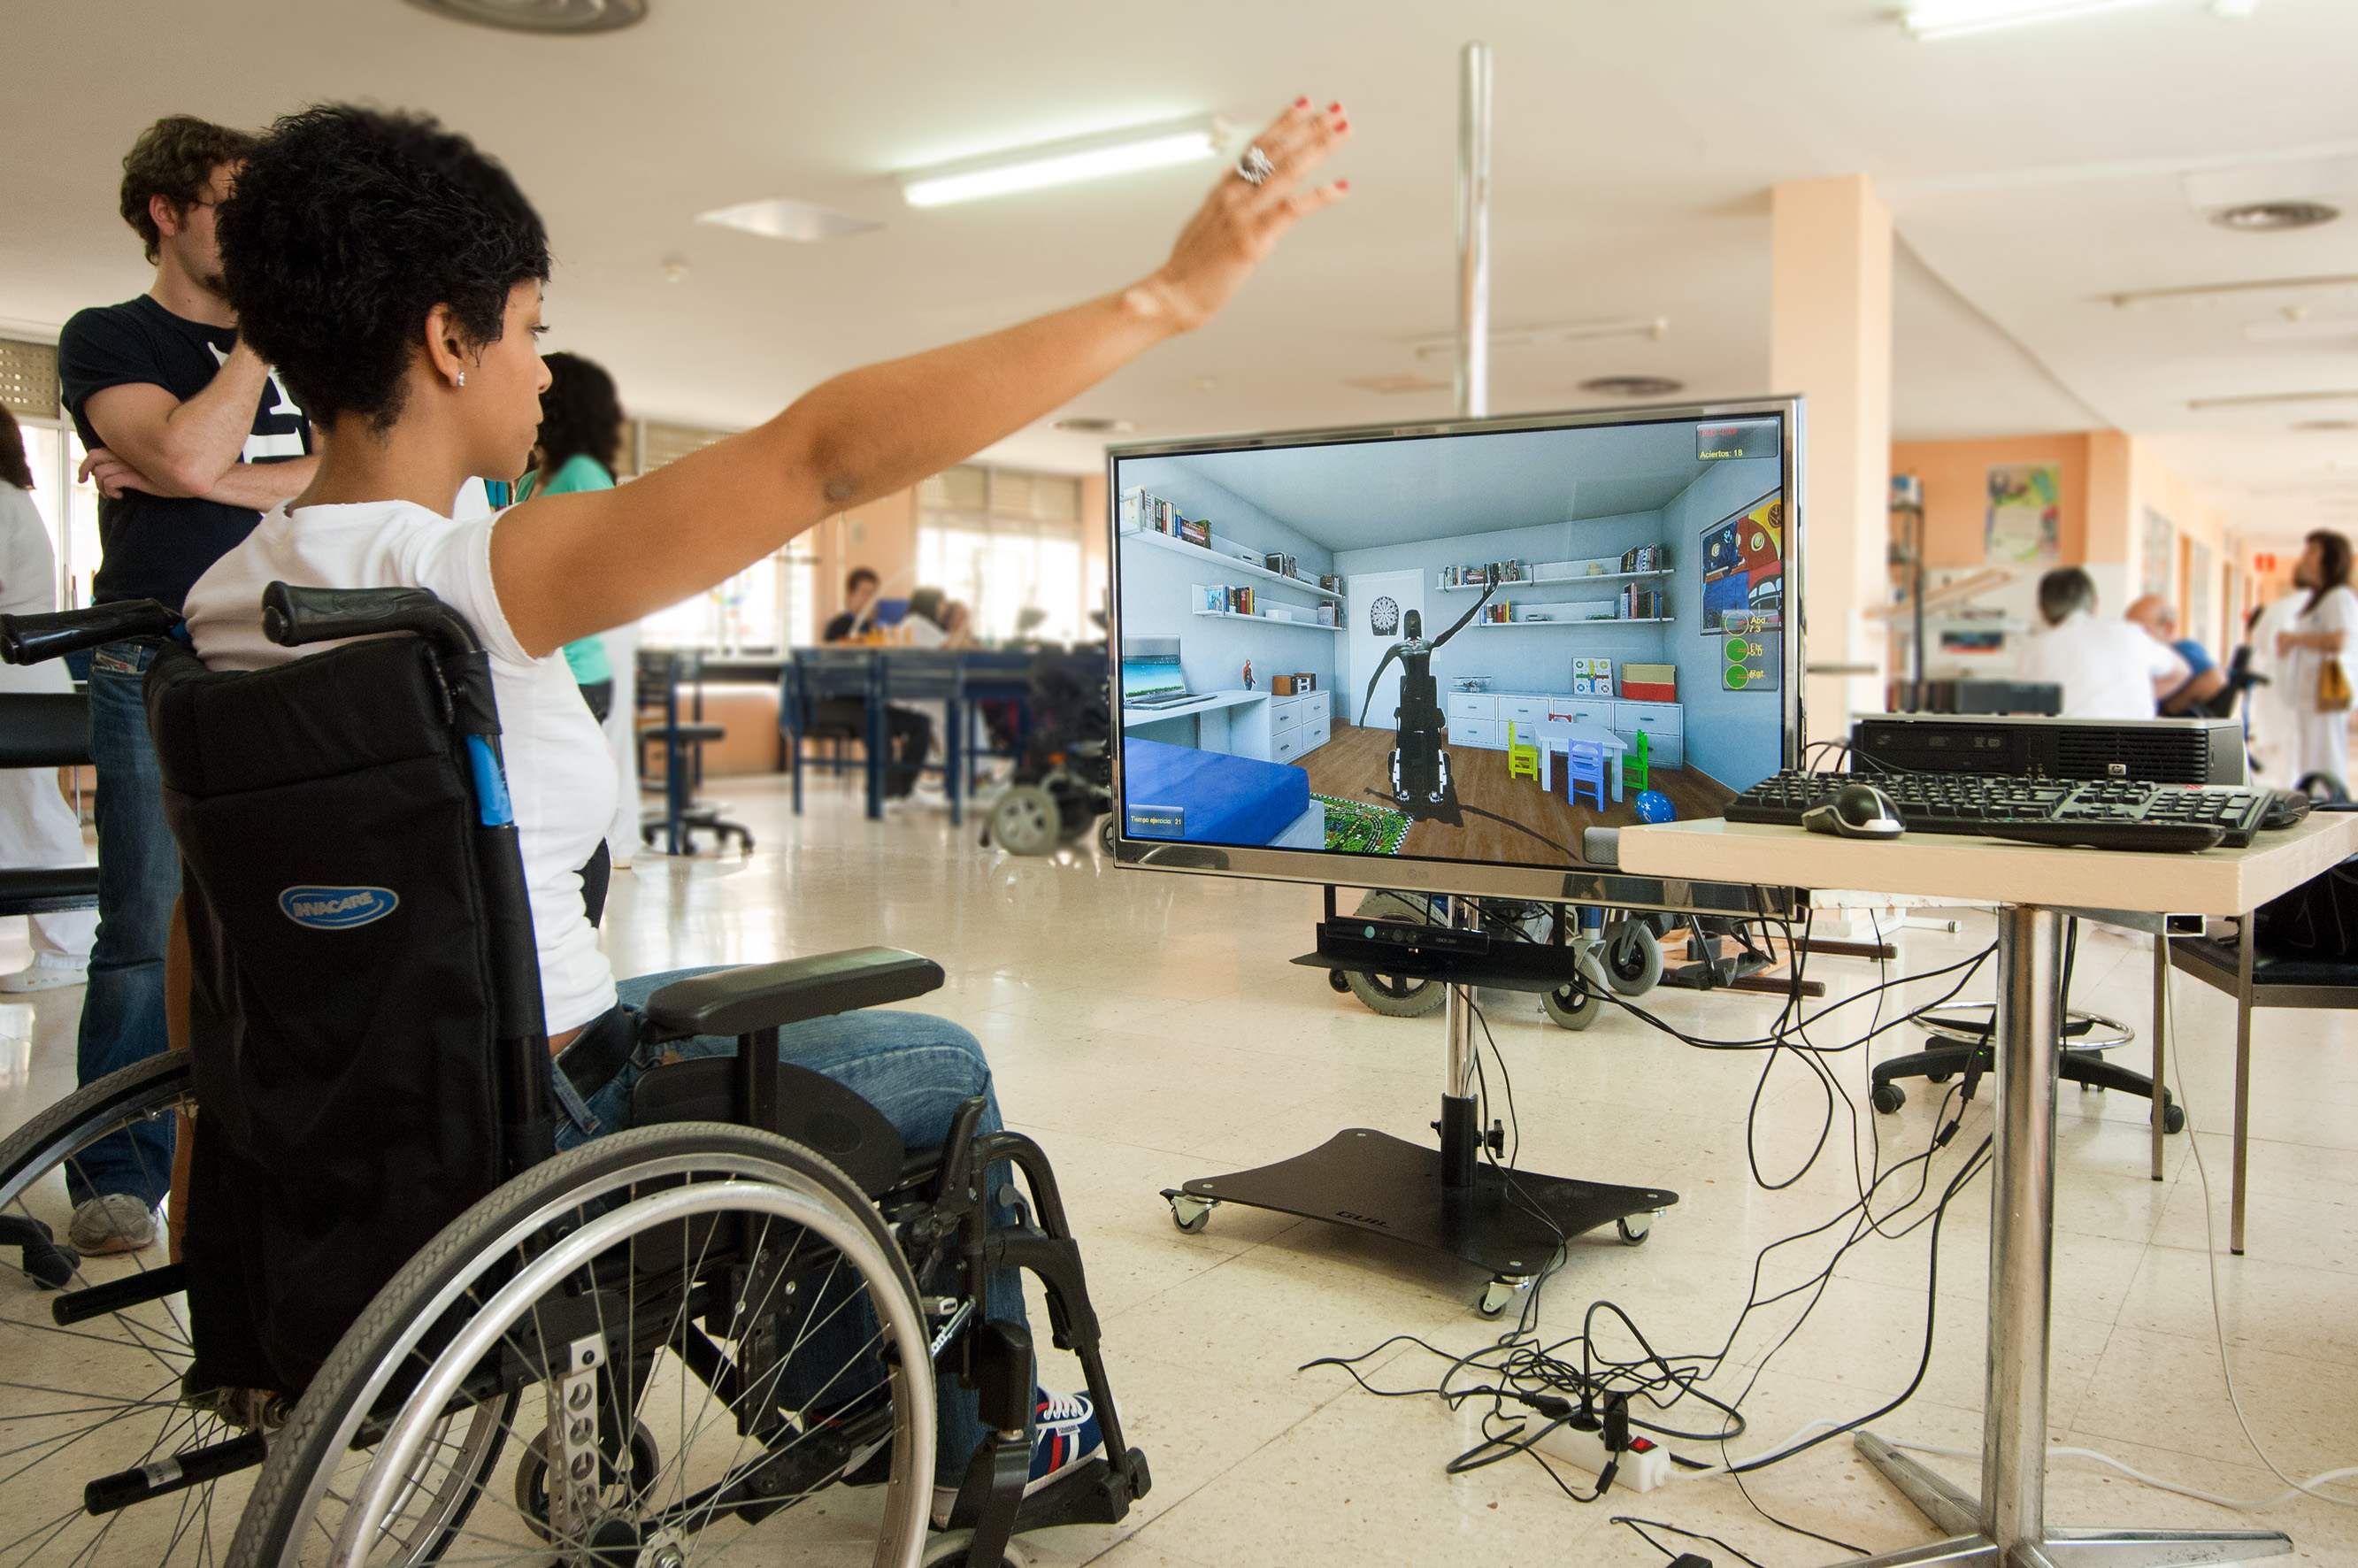 Fundación Hospital Nacional de Parapléjicos